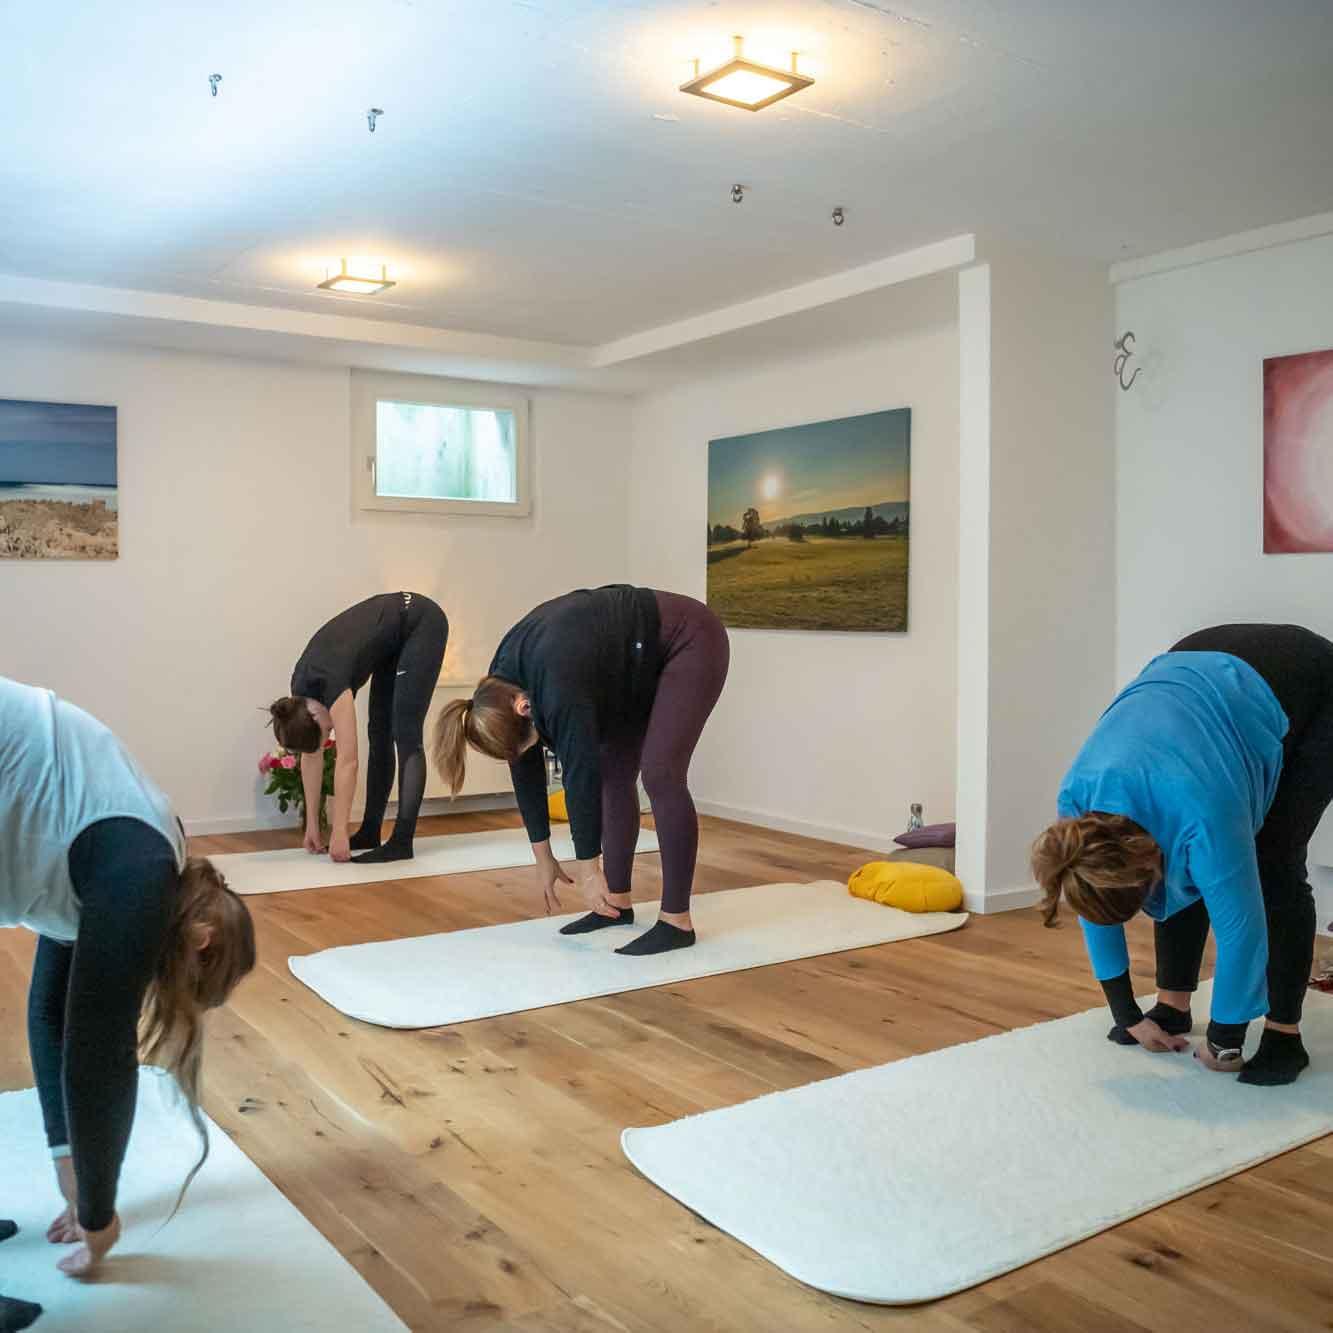 Kleingruppe Yoga Rothenburg Karin Amrein